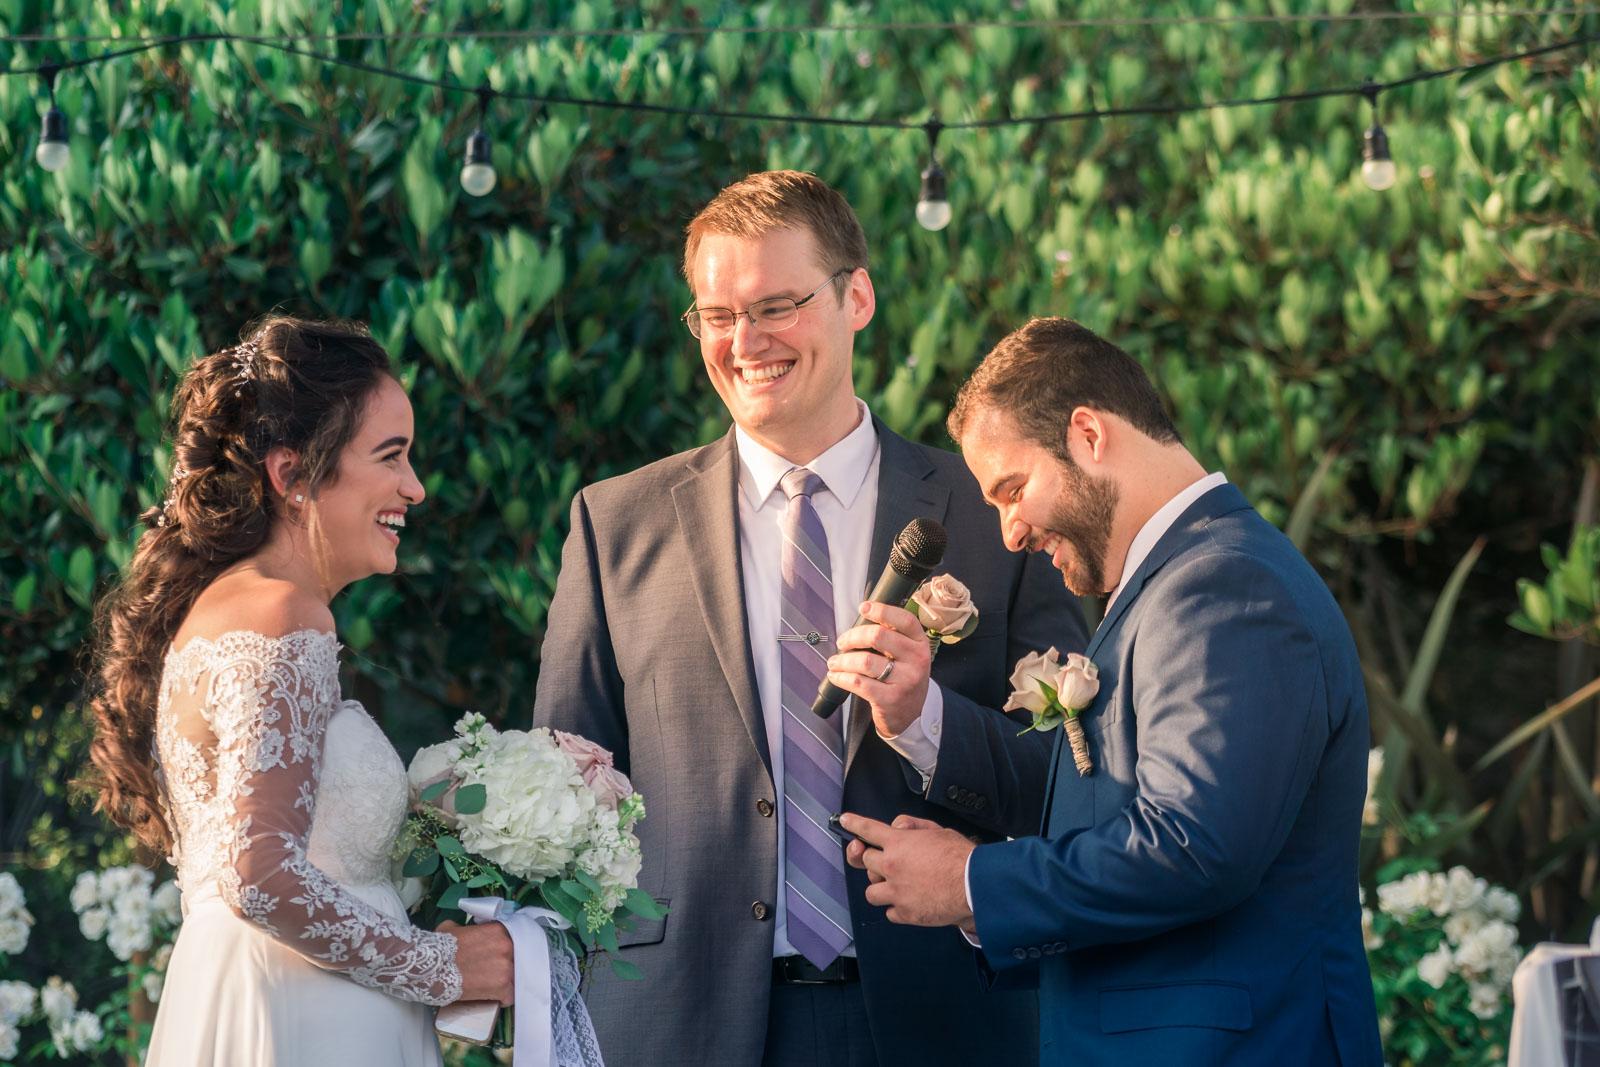 236_Angel-Brea-Orange-County_Joseph-Barber-Wedding-Photography.jpg